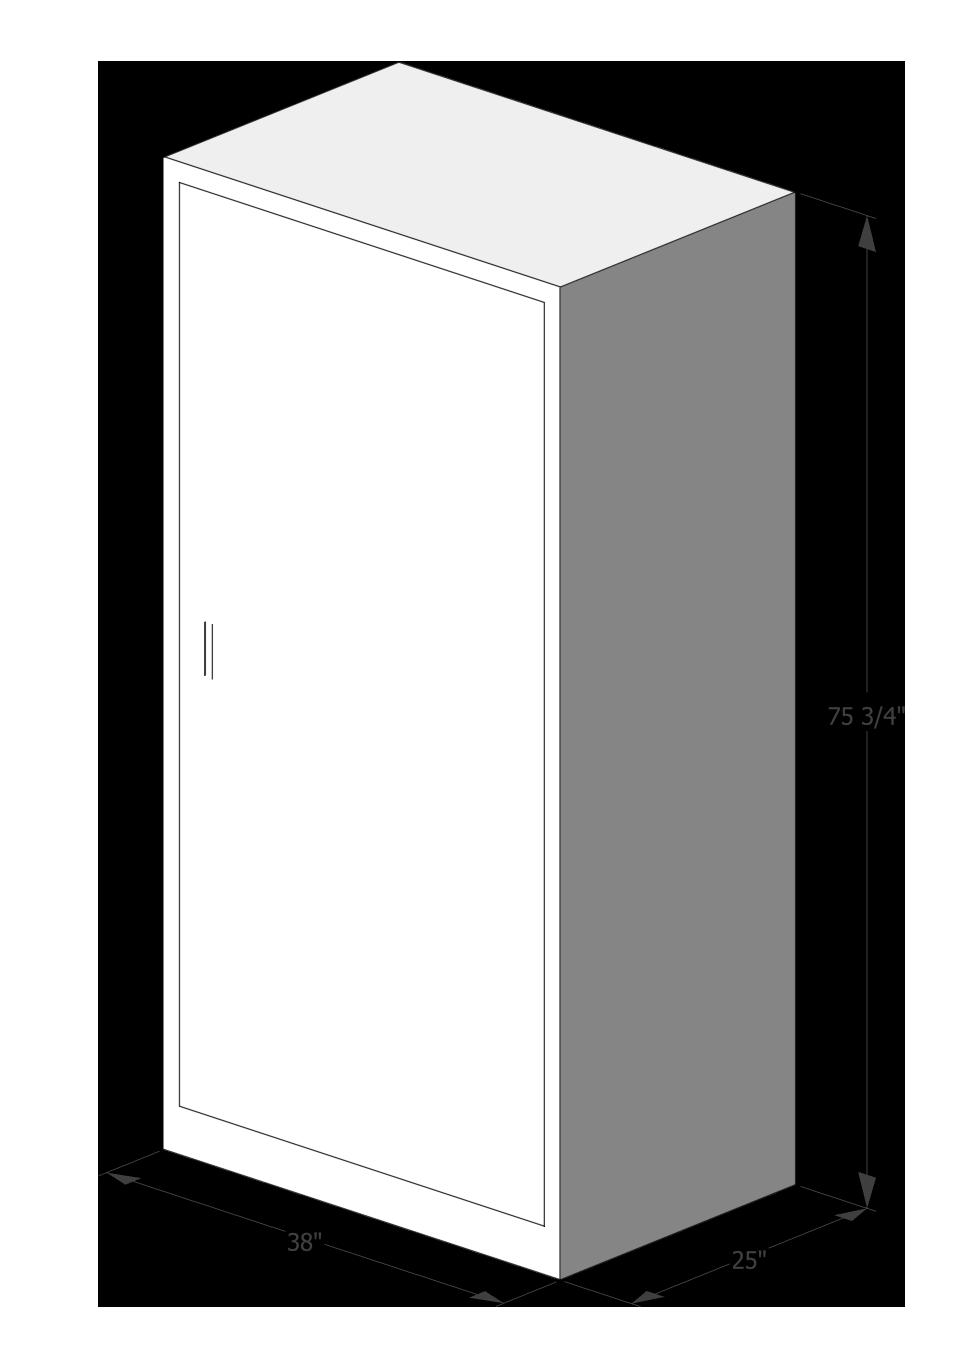 "Blueprint of Luxer One Oversized Package Locker measurements: 38""x 25""x 75 3/4"""